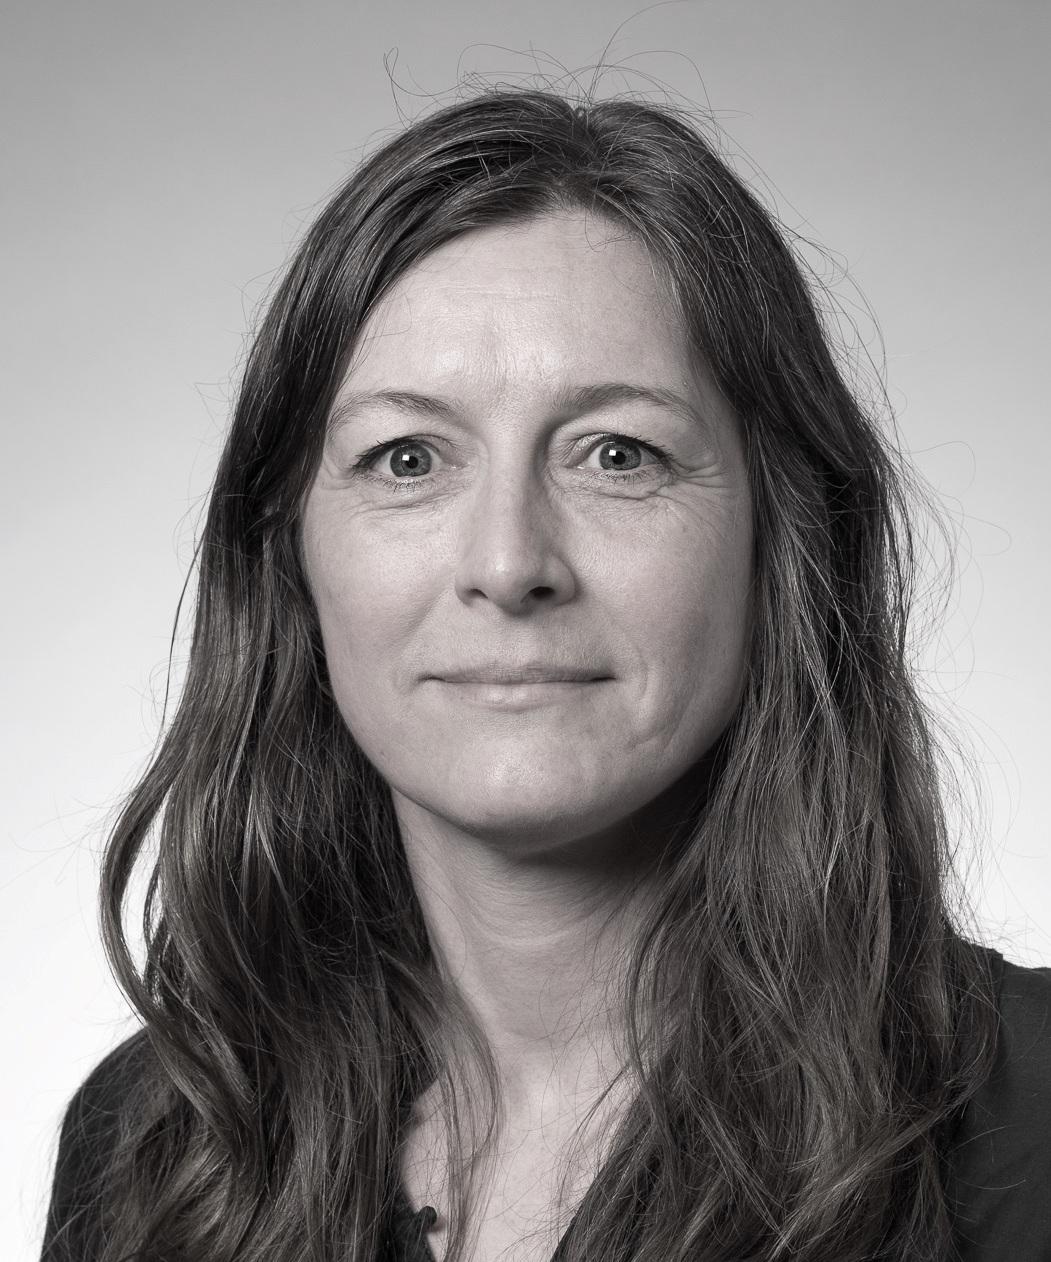 Linda Aagaard Rasmussen